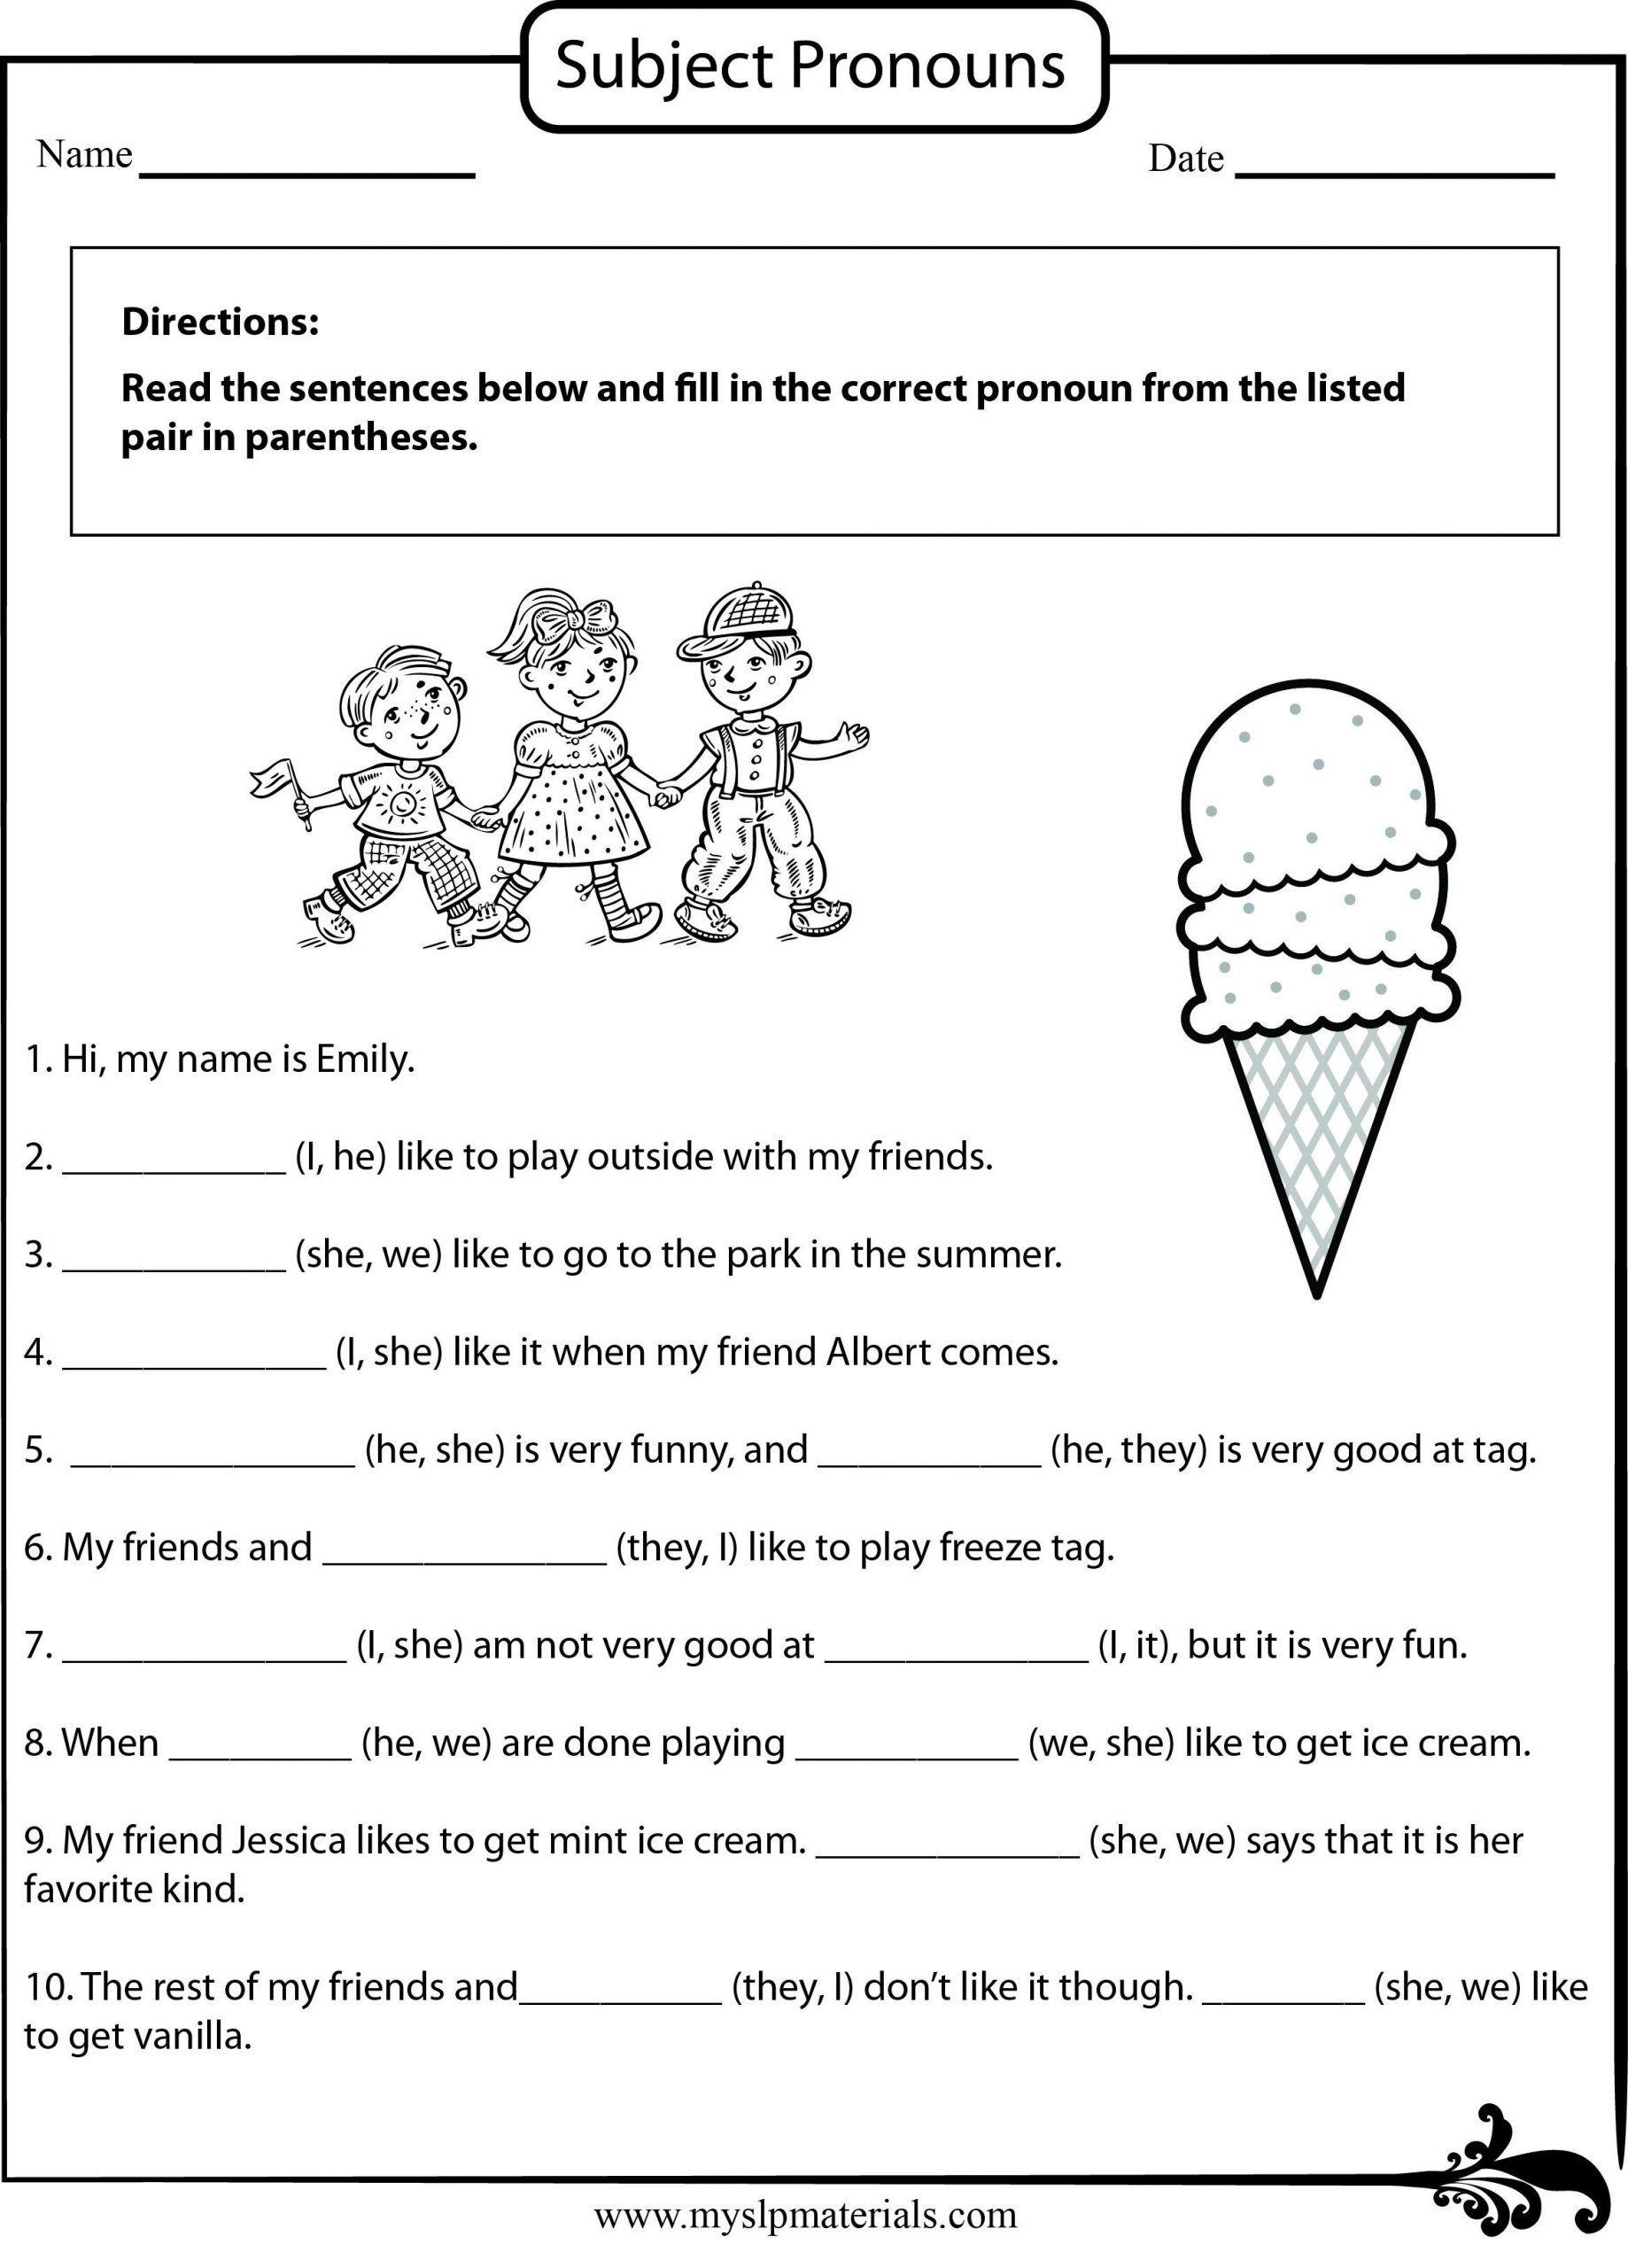 English Worksheet For Grade 2 Subject Pronoun Speech In